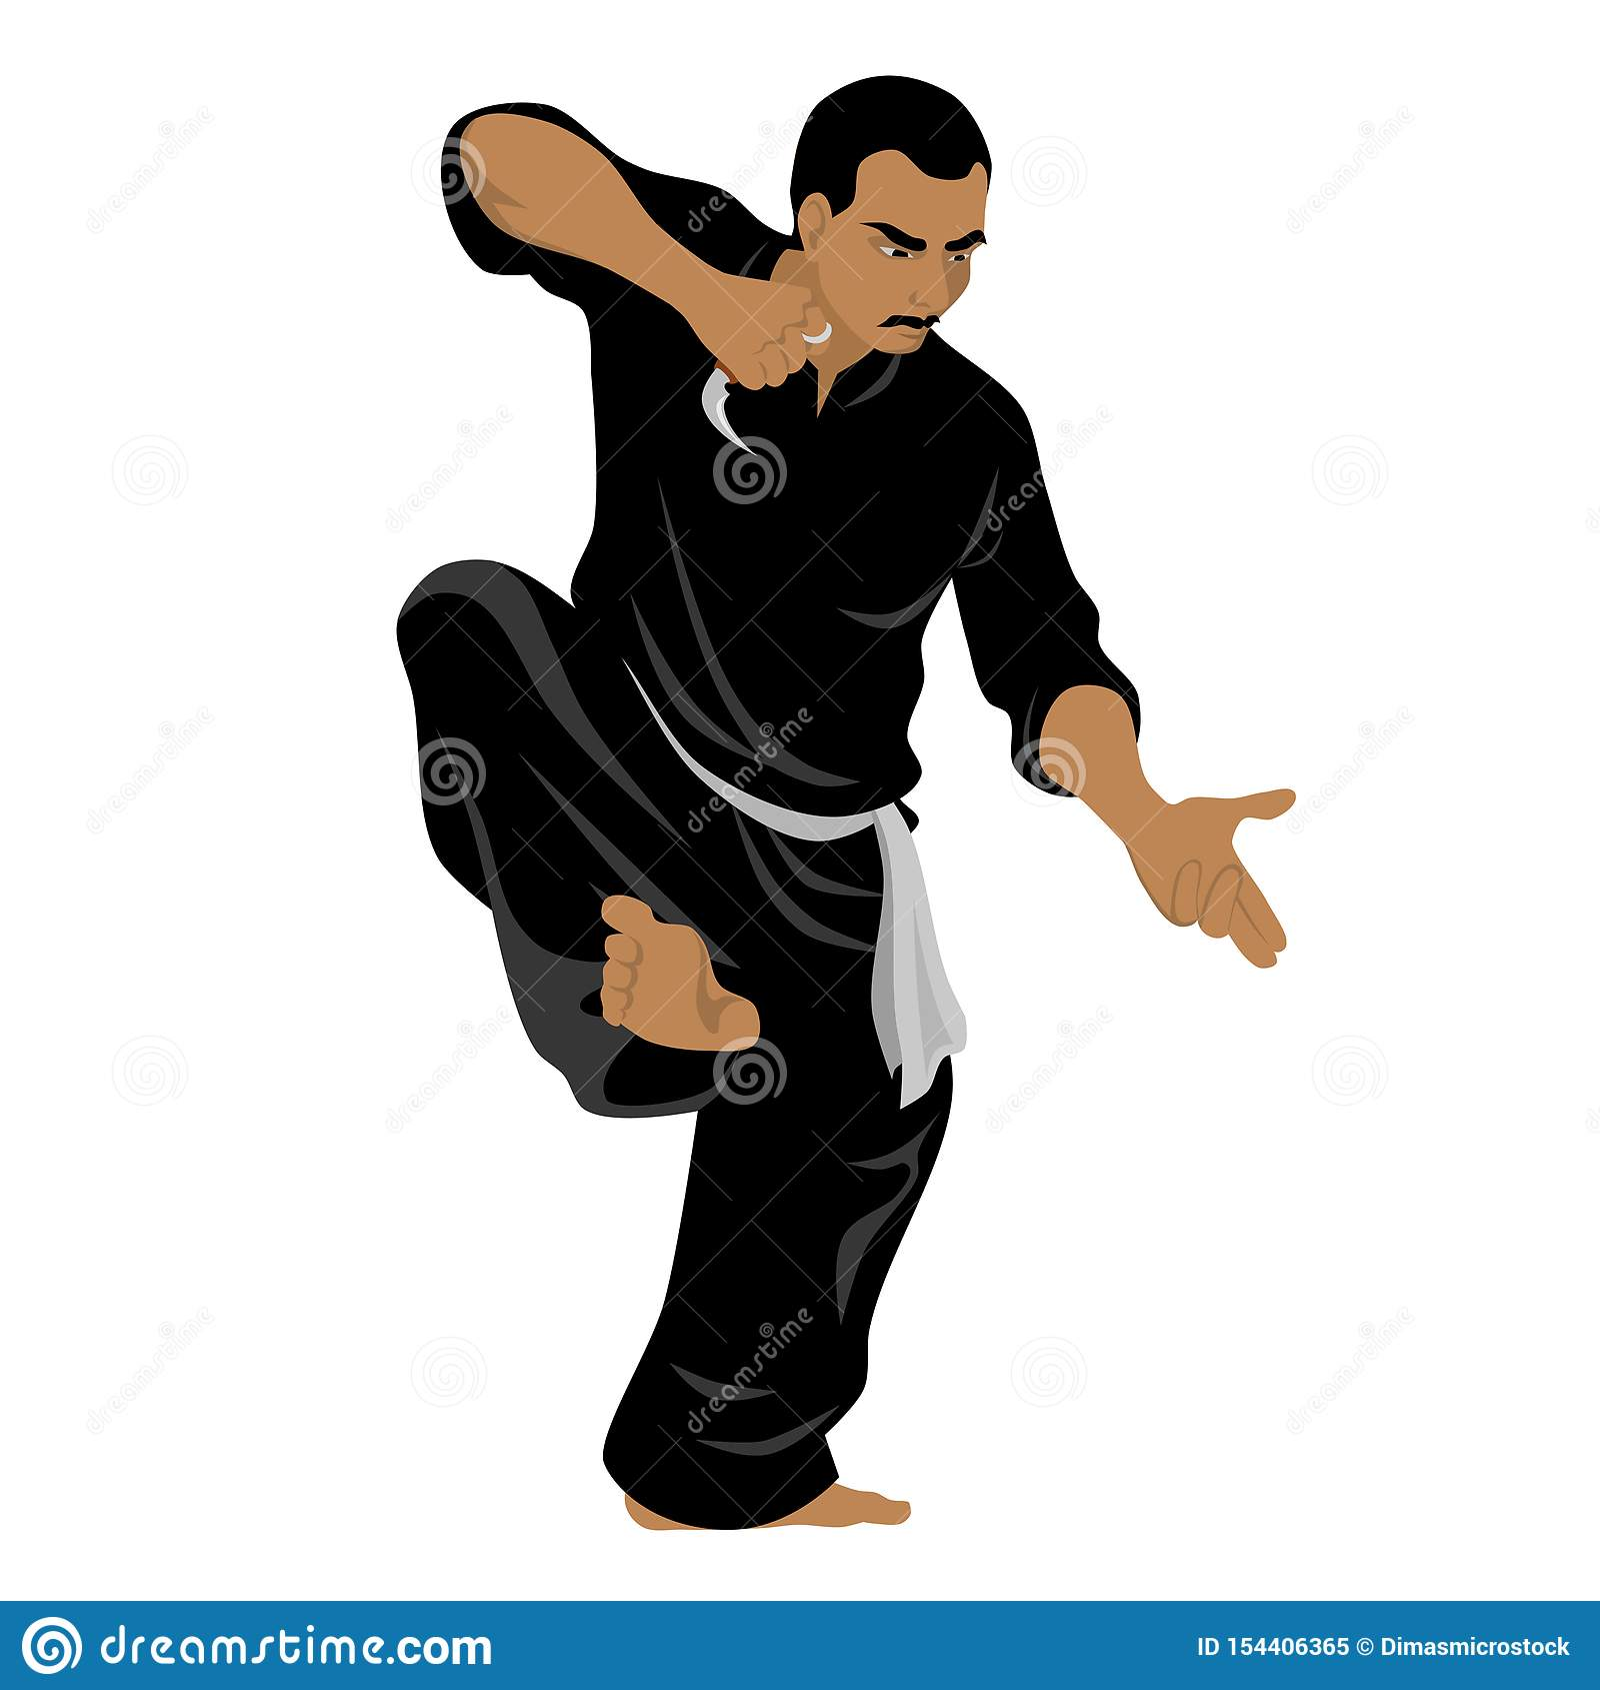 Perguruan pencak silat satria muda indonesia logo vector. Pendekar Silat Stock Illustrations 17 Pendekar Silat Stock Illustrations Vectors Clipart Dreamstime